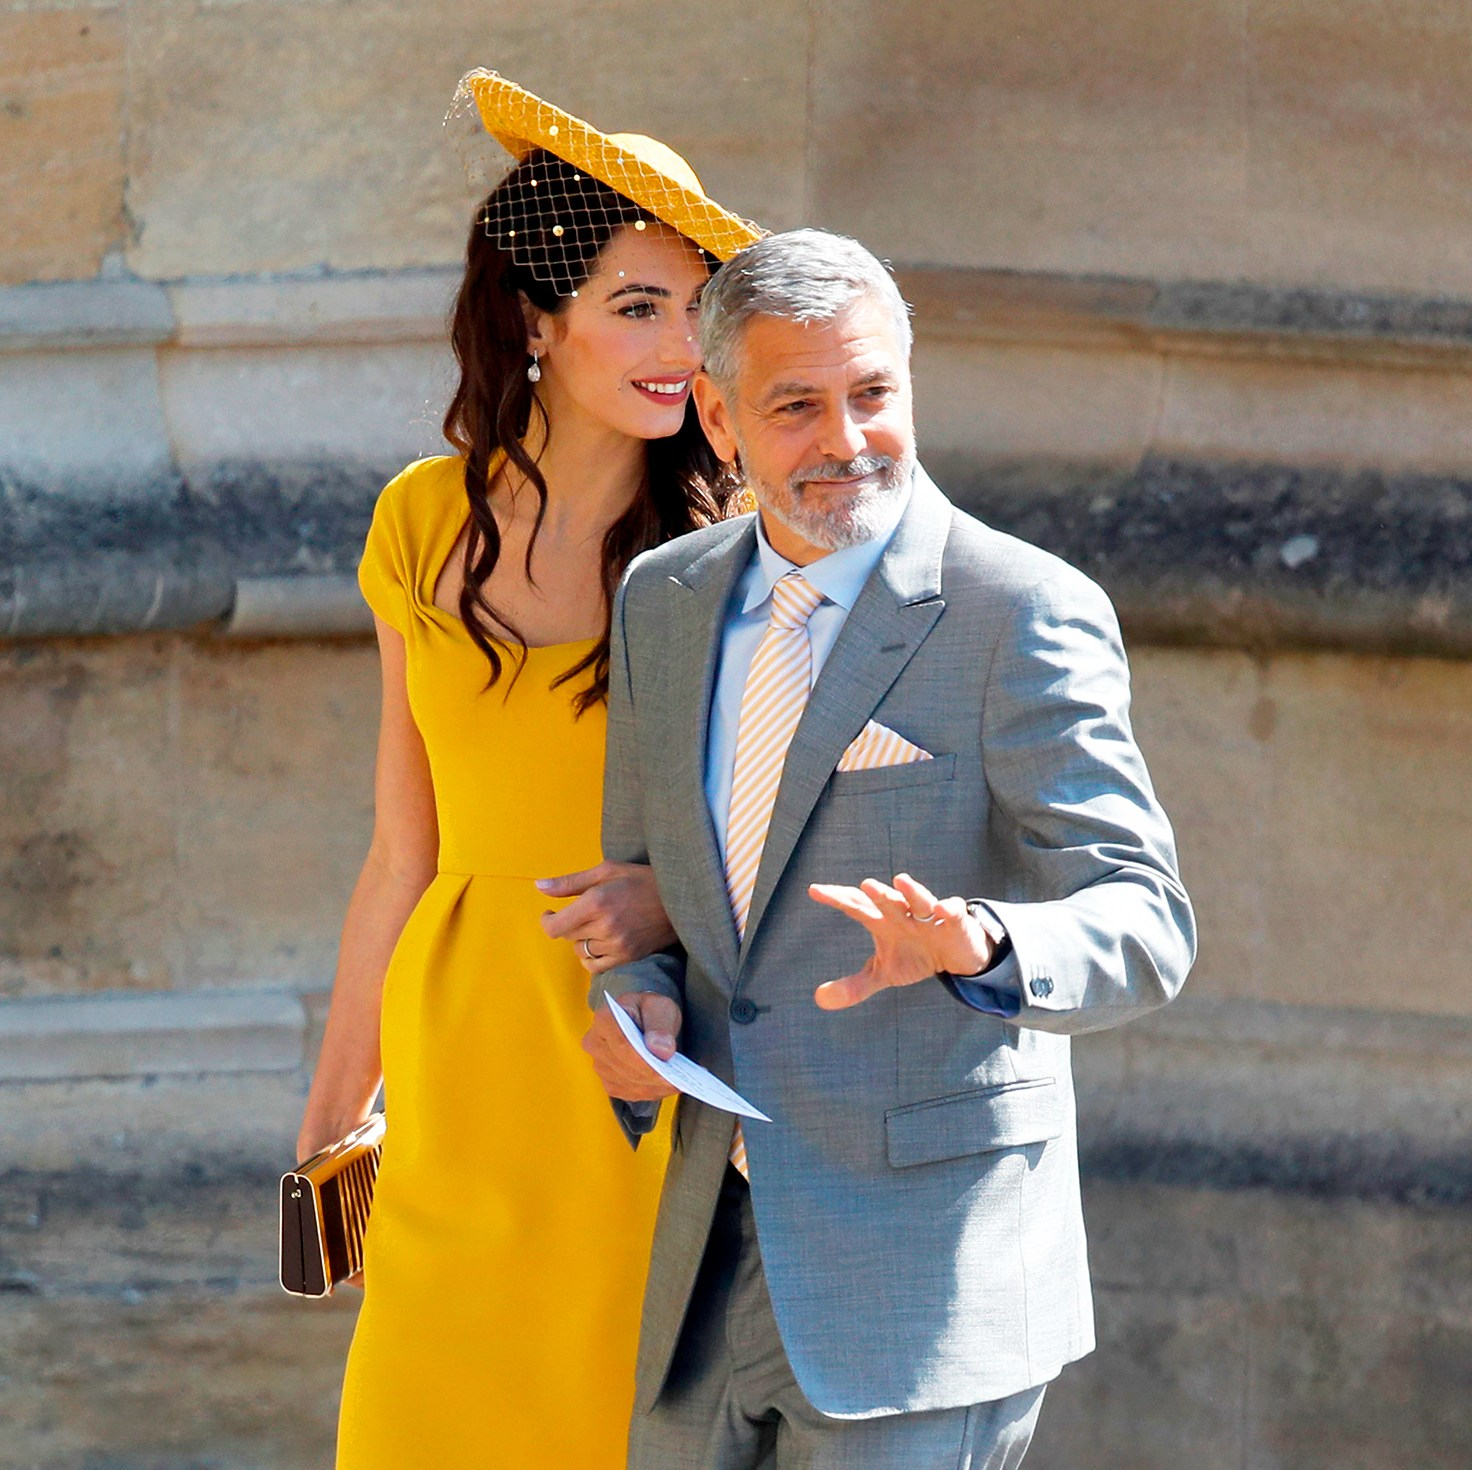 George Clooney and Amal Clooney Royal Wedding Gallery